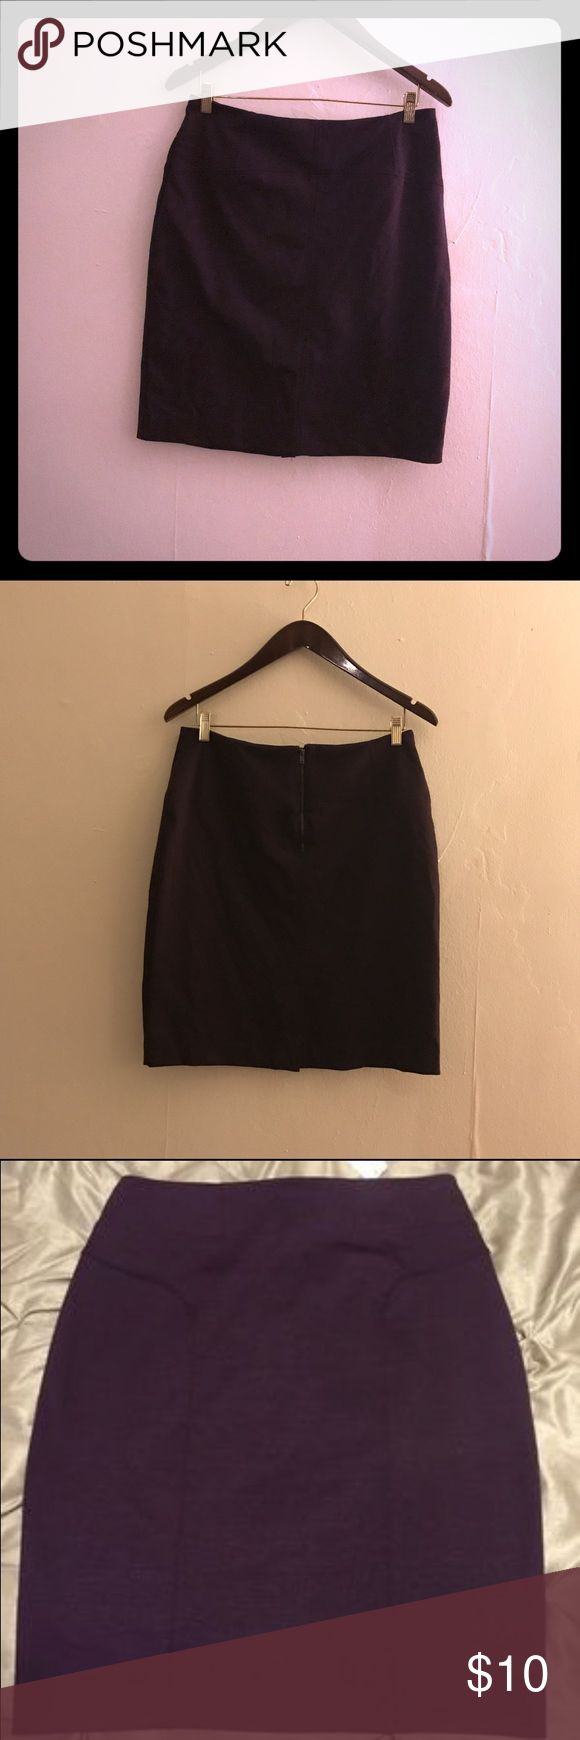 NY & Co Dark Purple Stretch Skirt Brand New New York & Company Skirts Midi